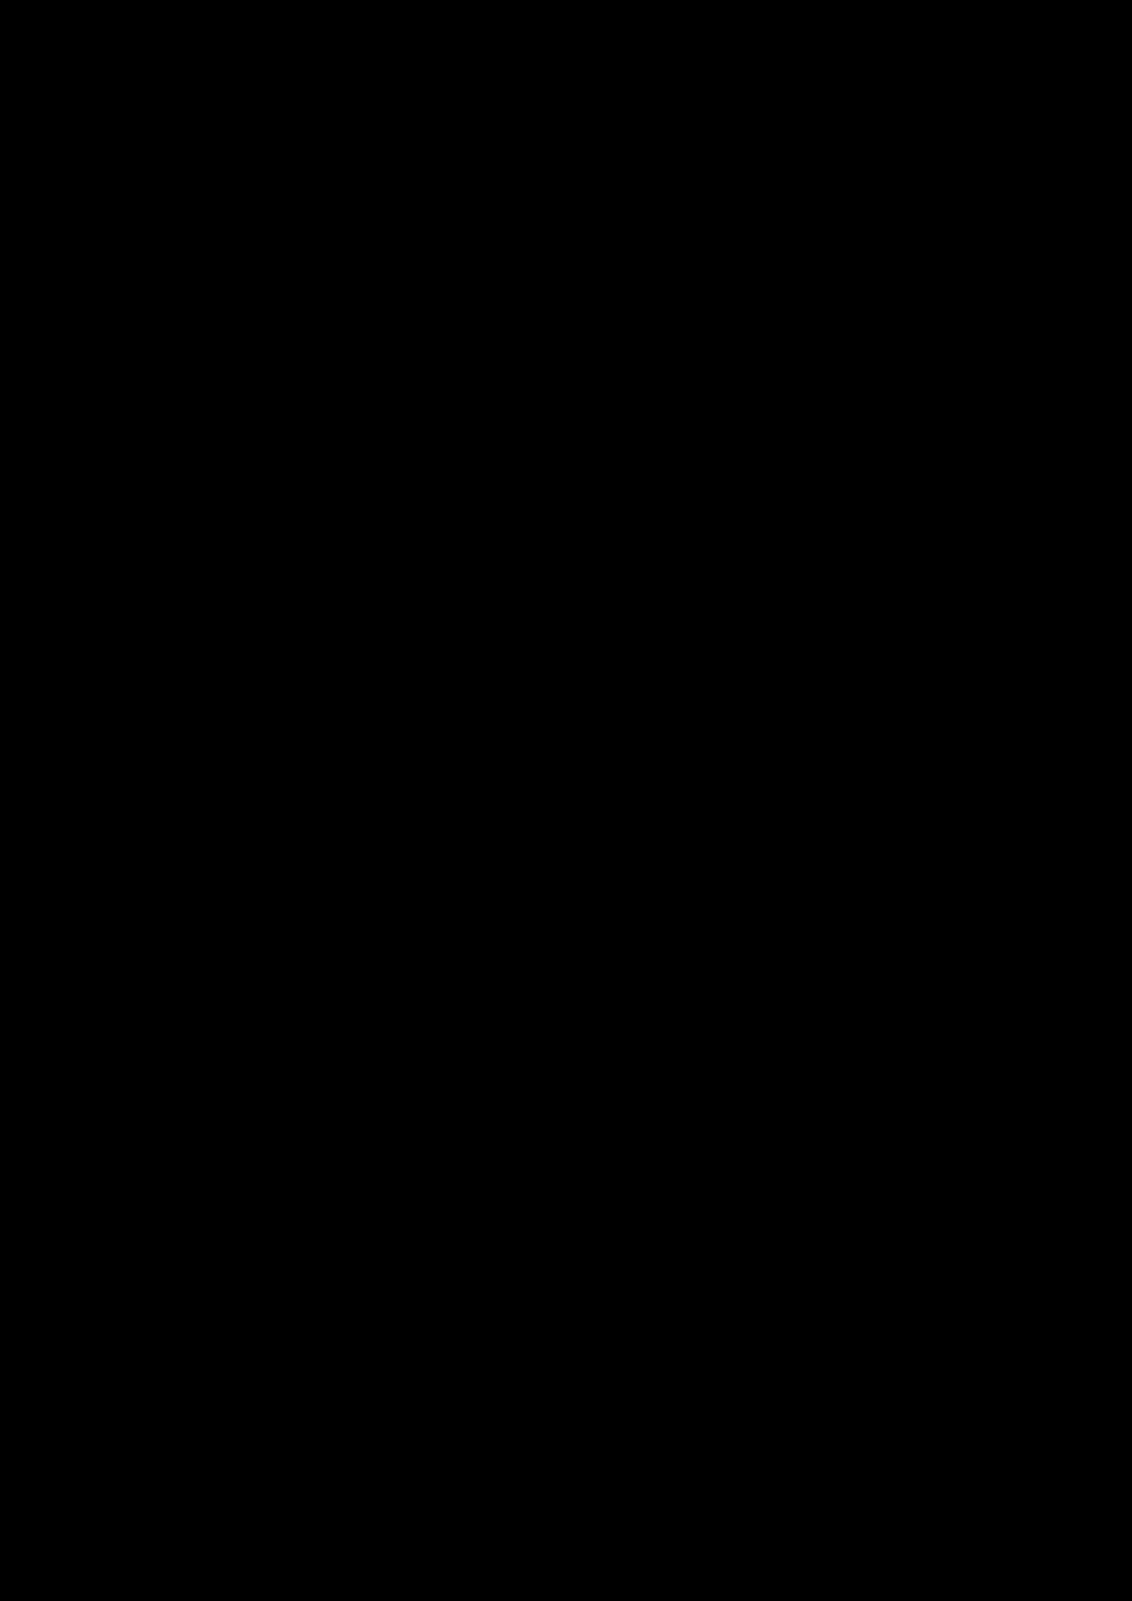 CHujina slide, Image 6